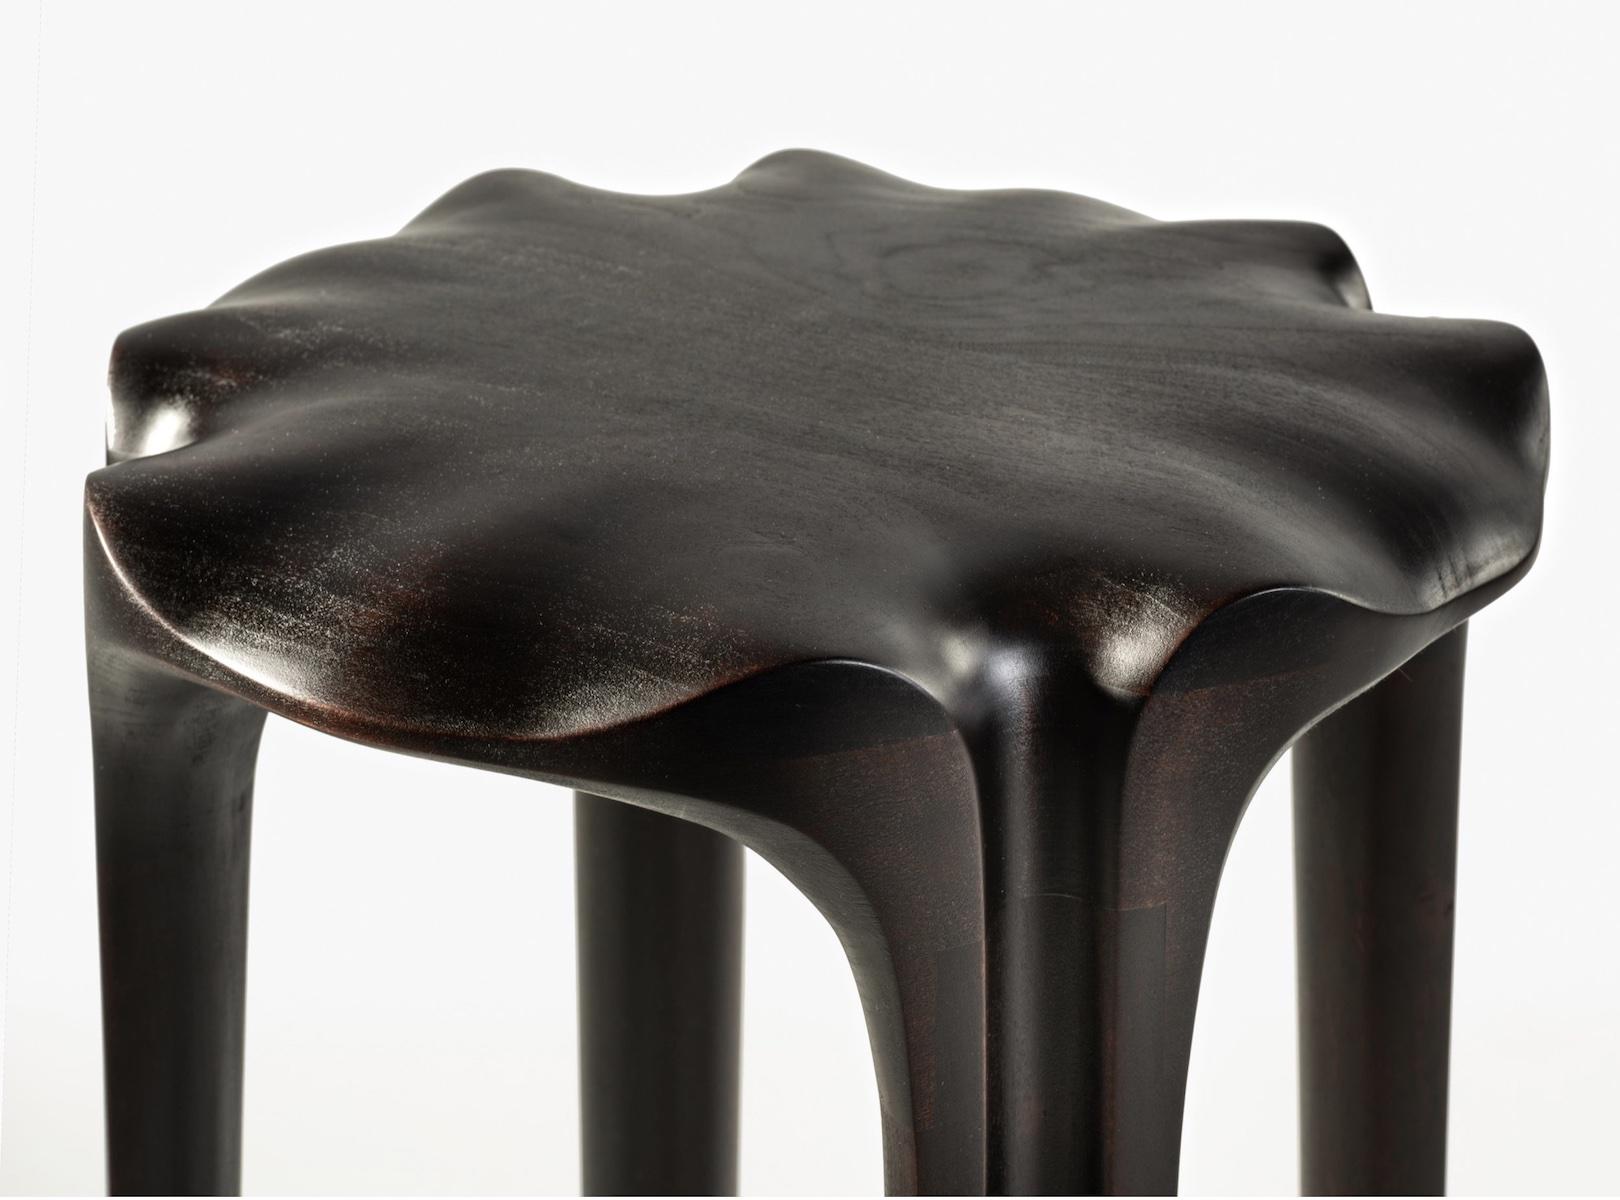 top detail of the Pavilion Stool by artist Christopher Kurtz